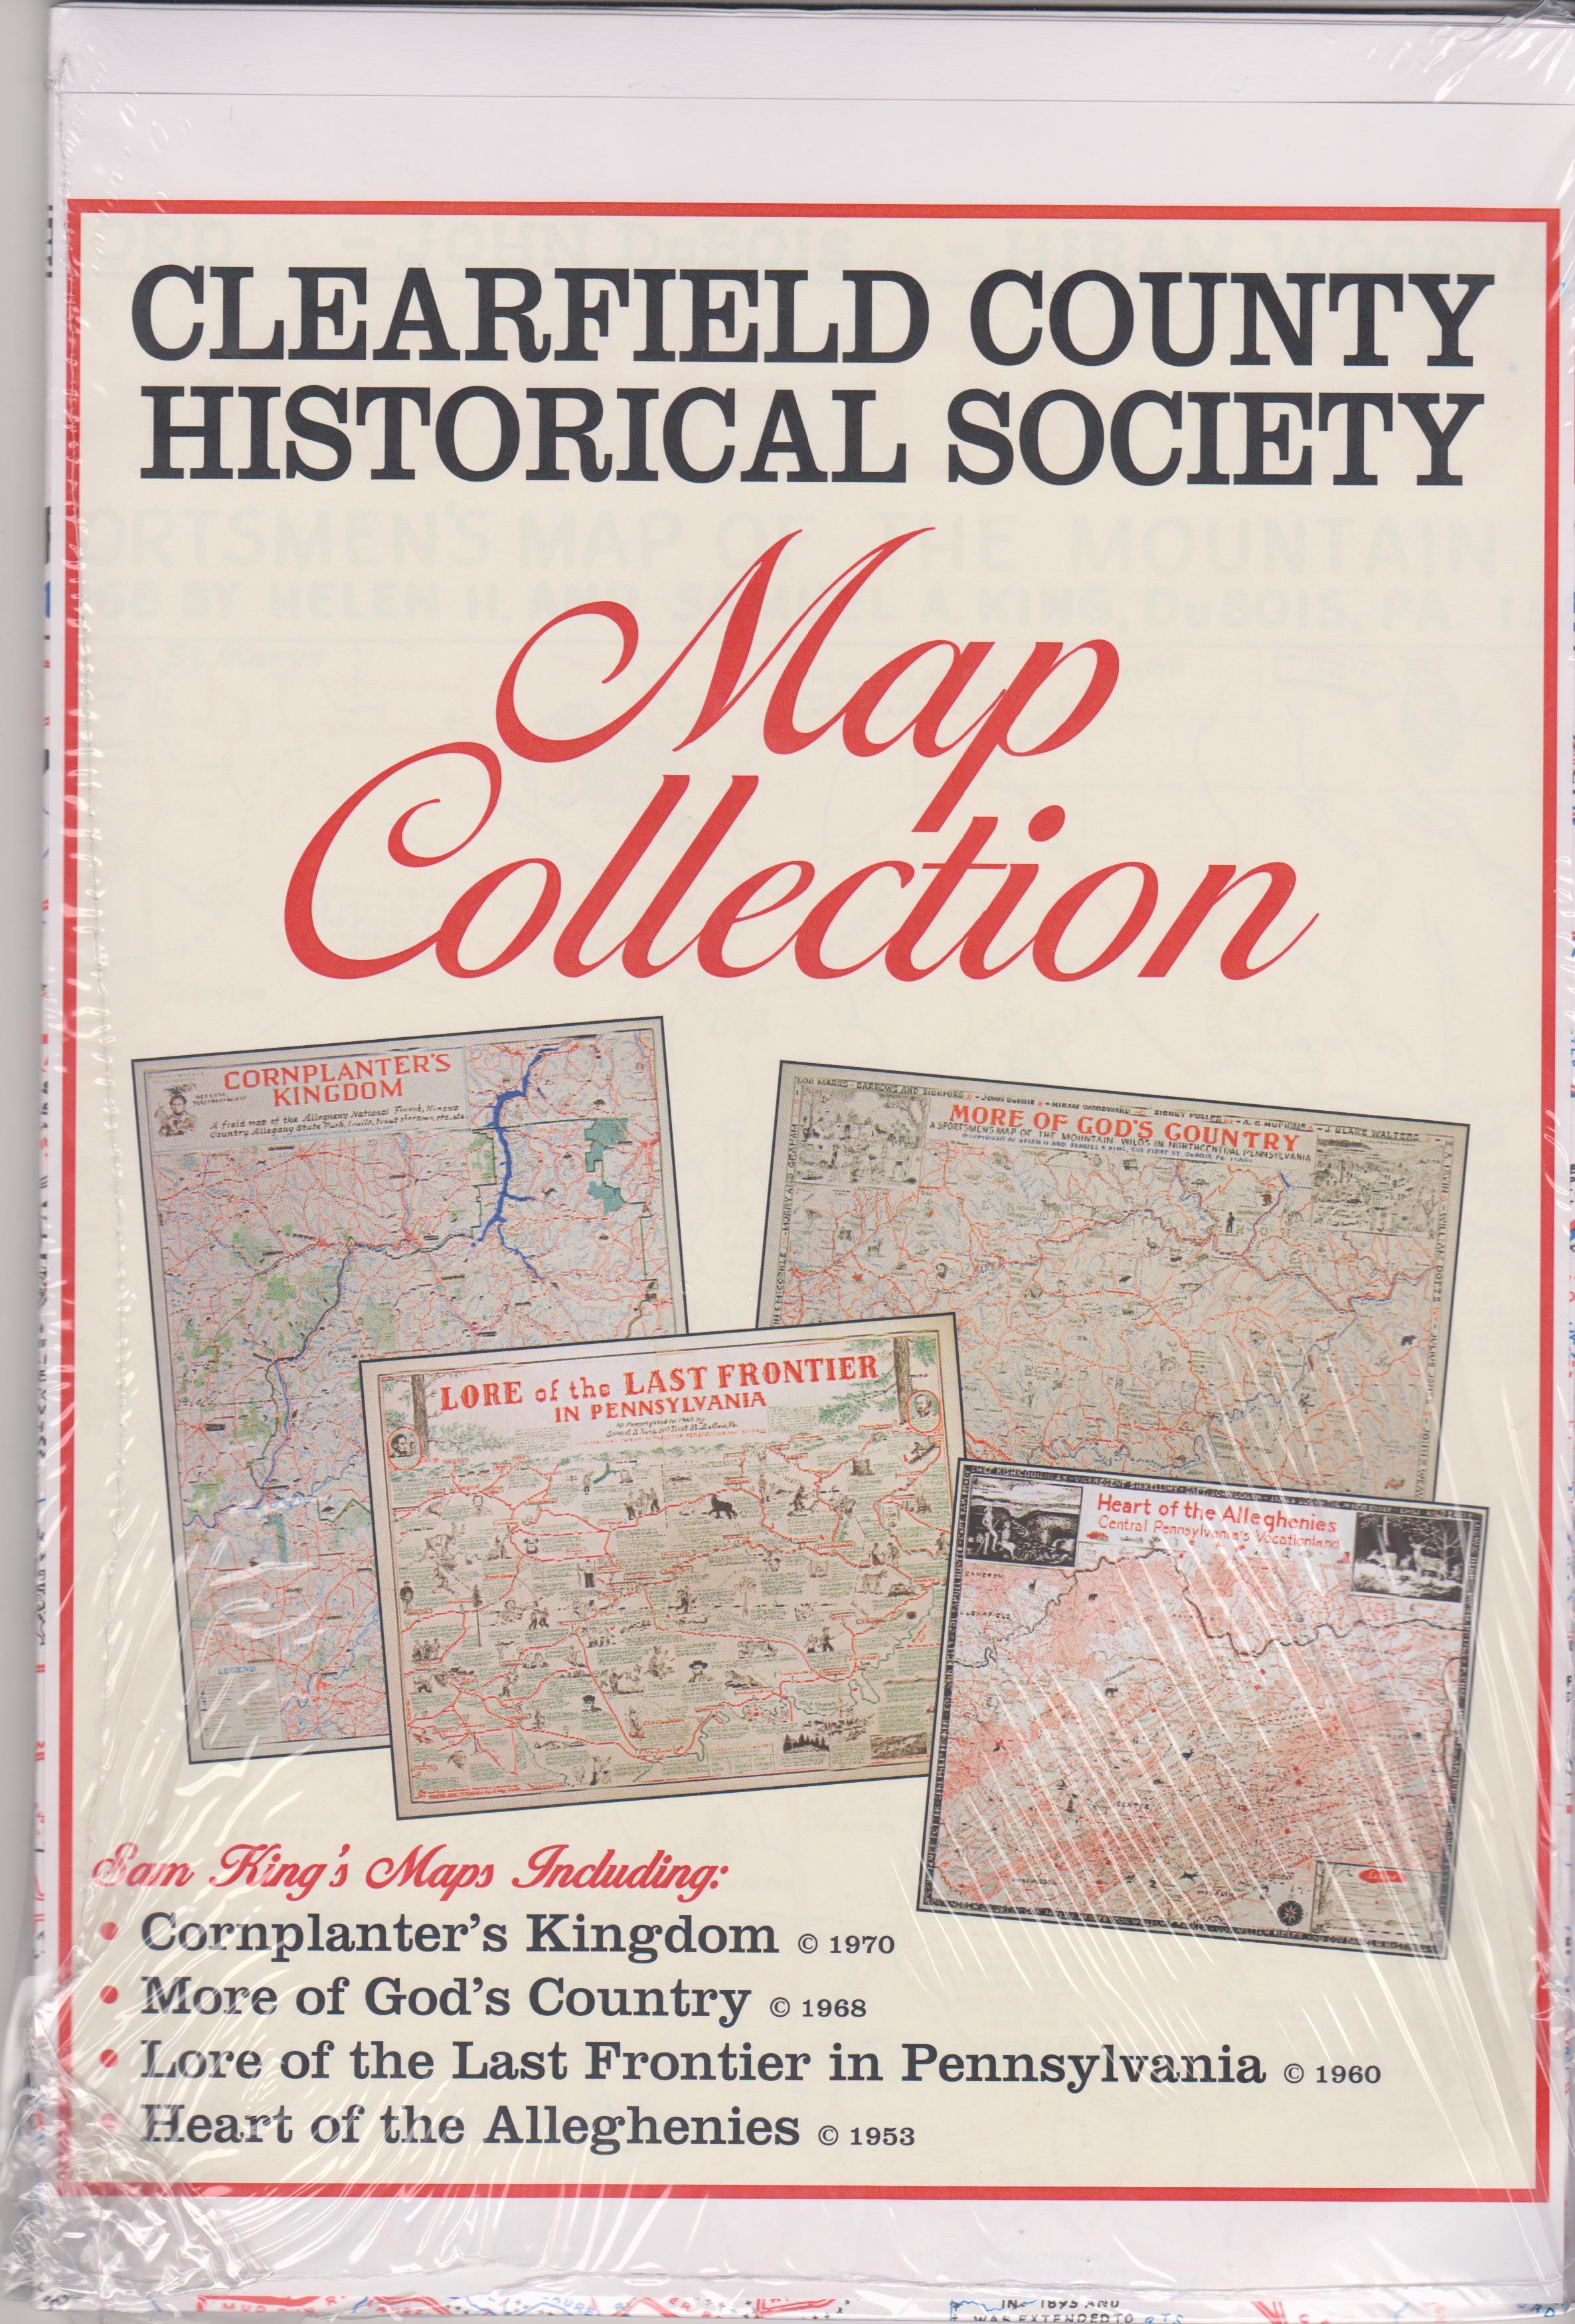 Sam King's Maps